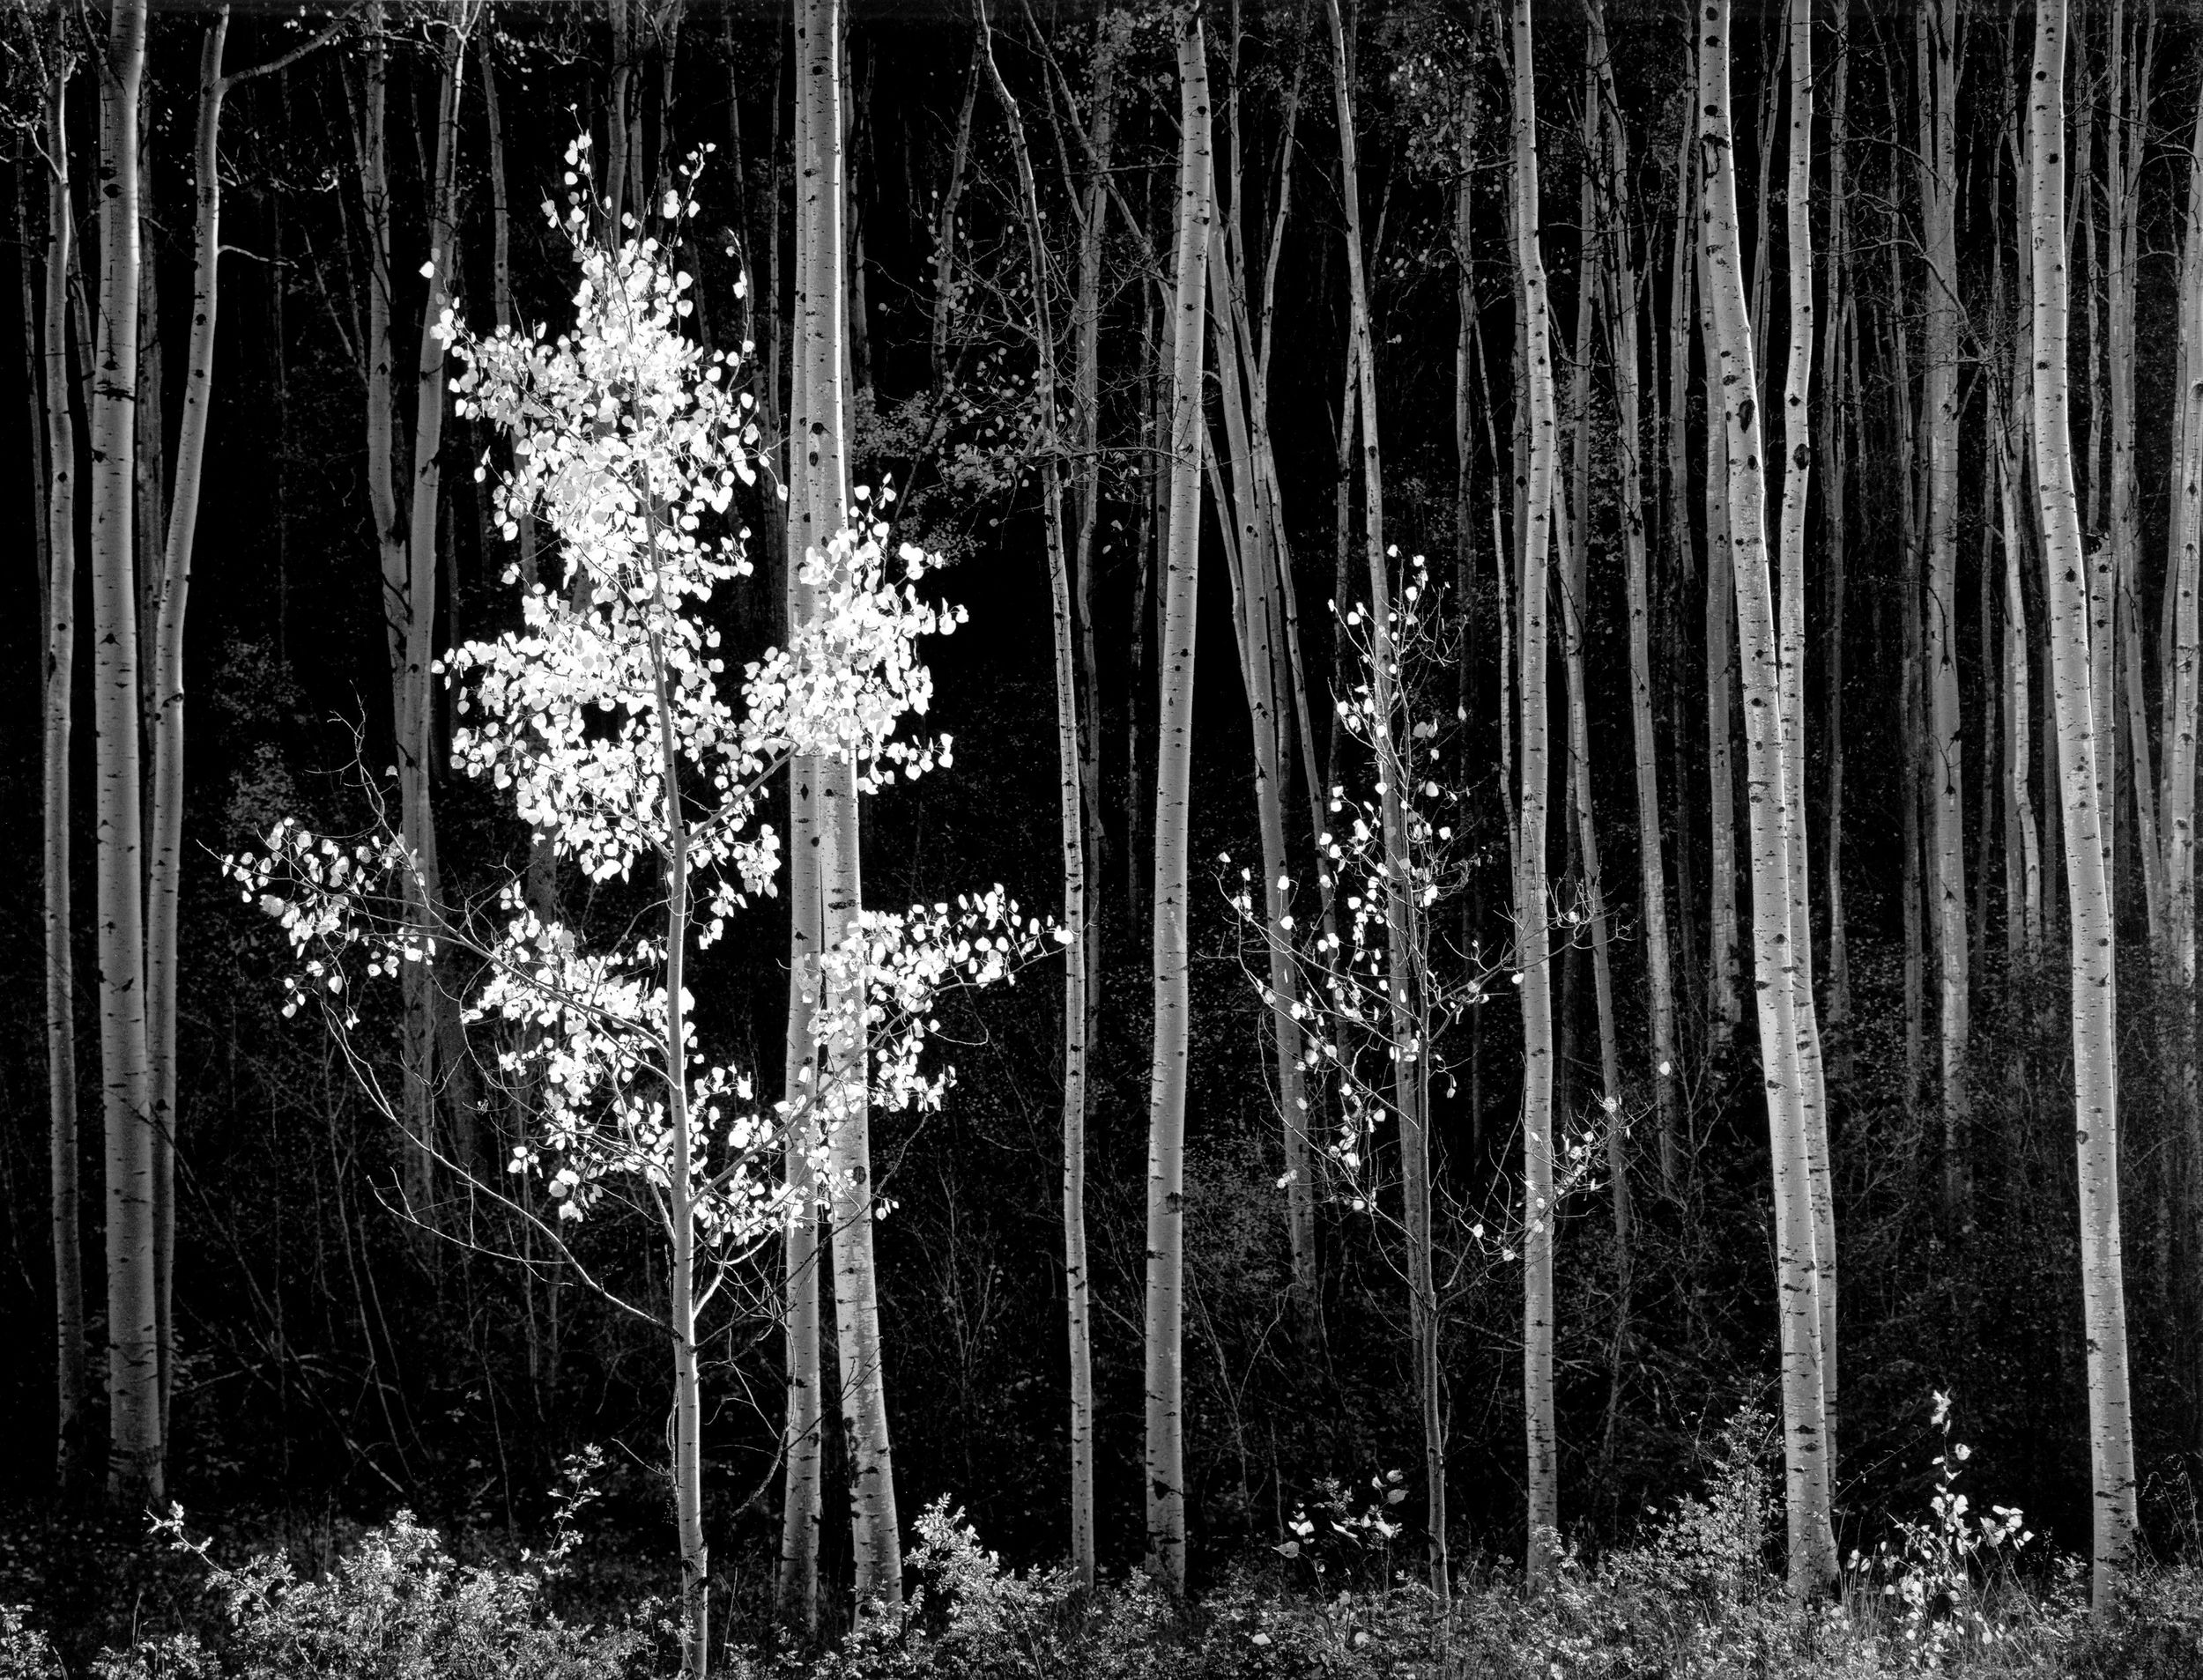 Ansel Adams, Aspens, Northern New Mexico, 1958, gelatin silver print